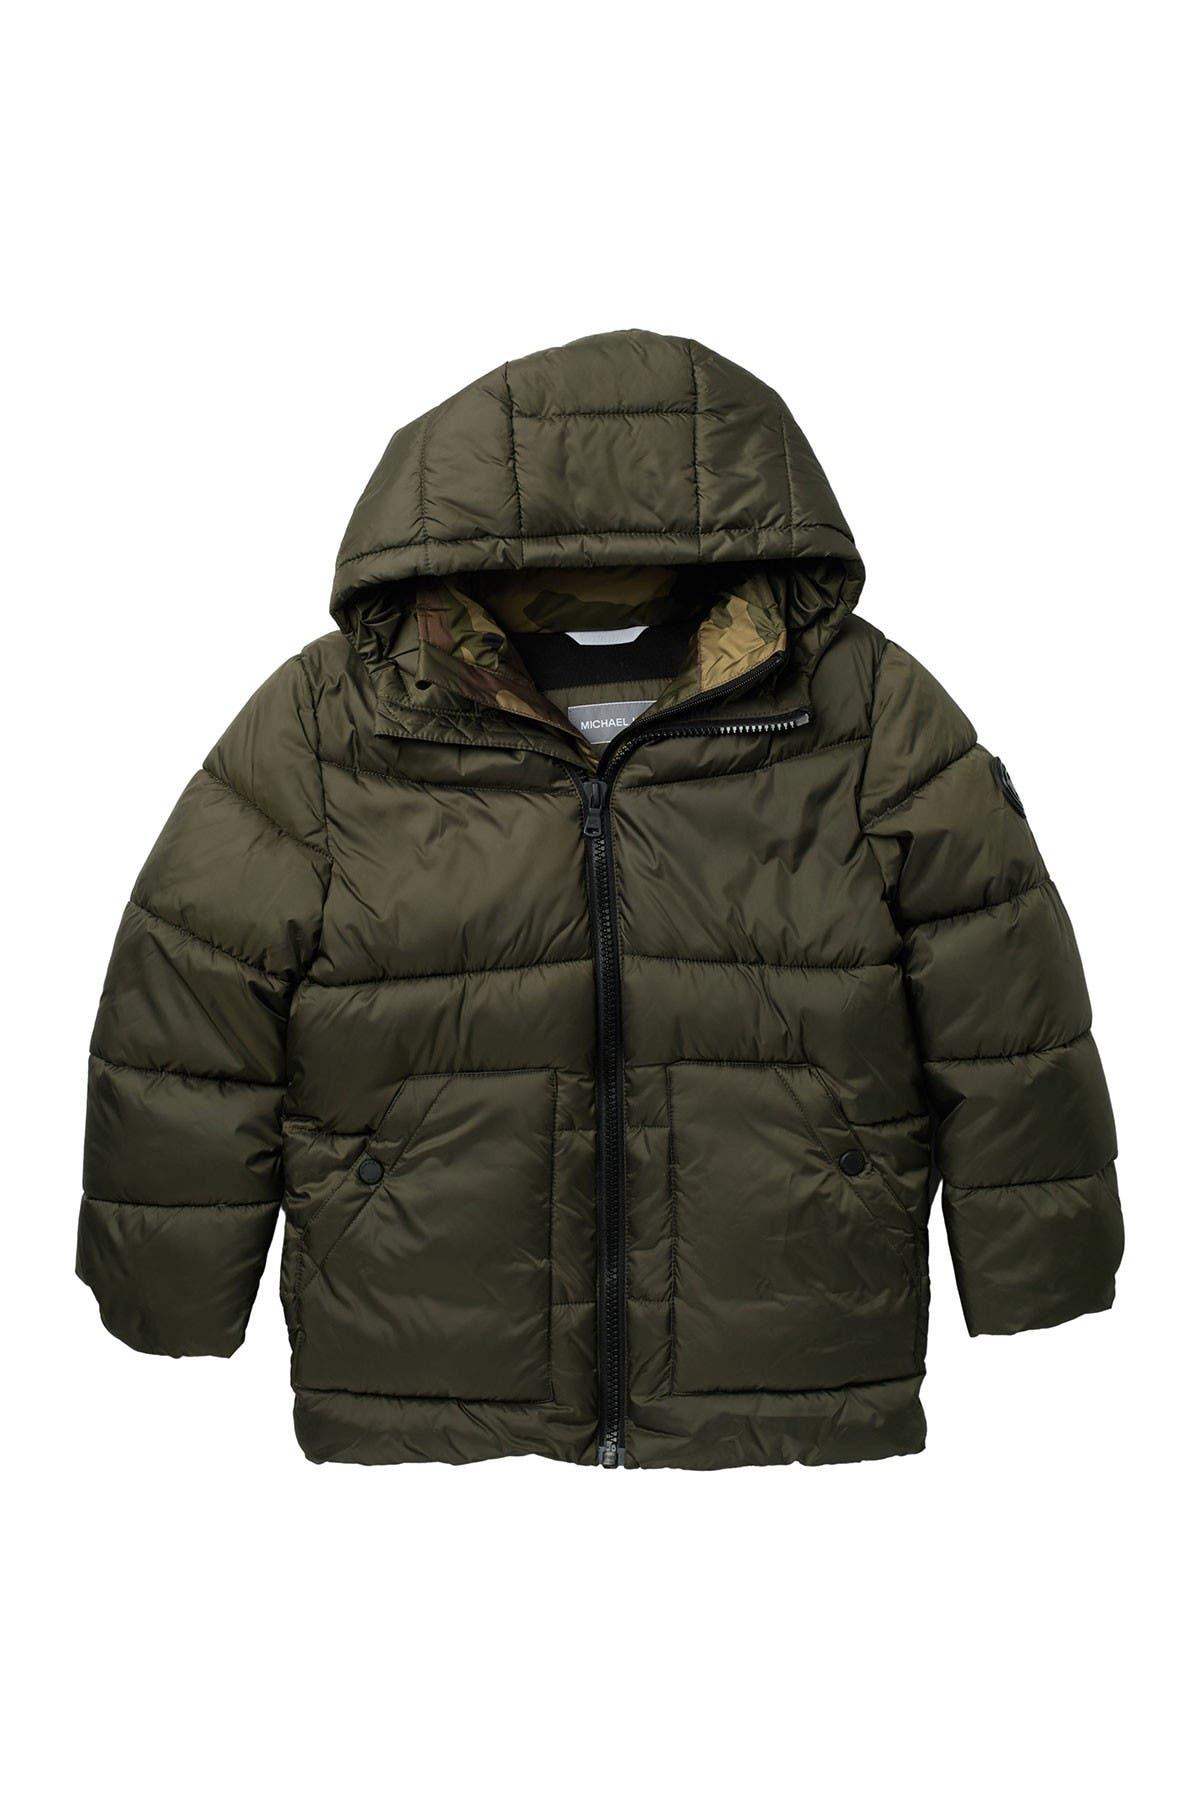 Image of Michael Kors Puffer Jacket